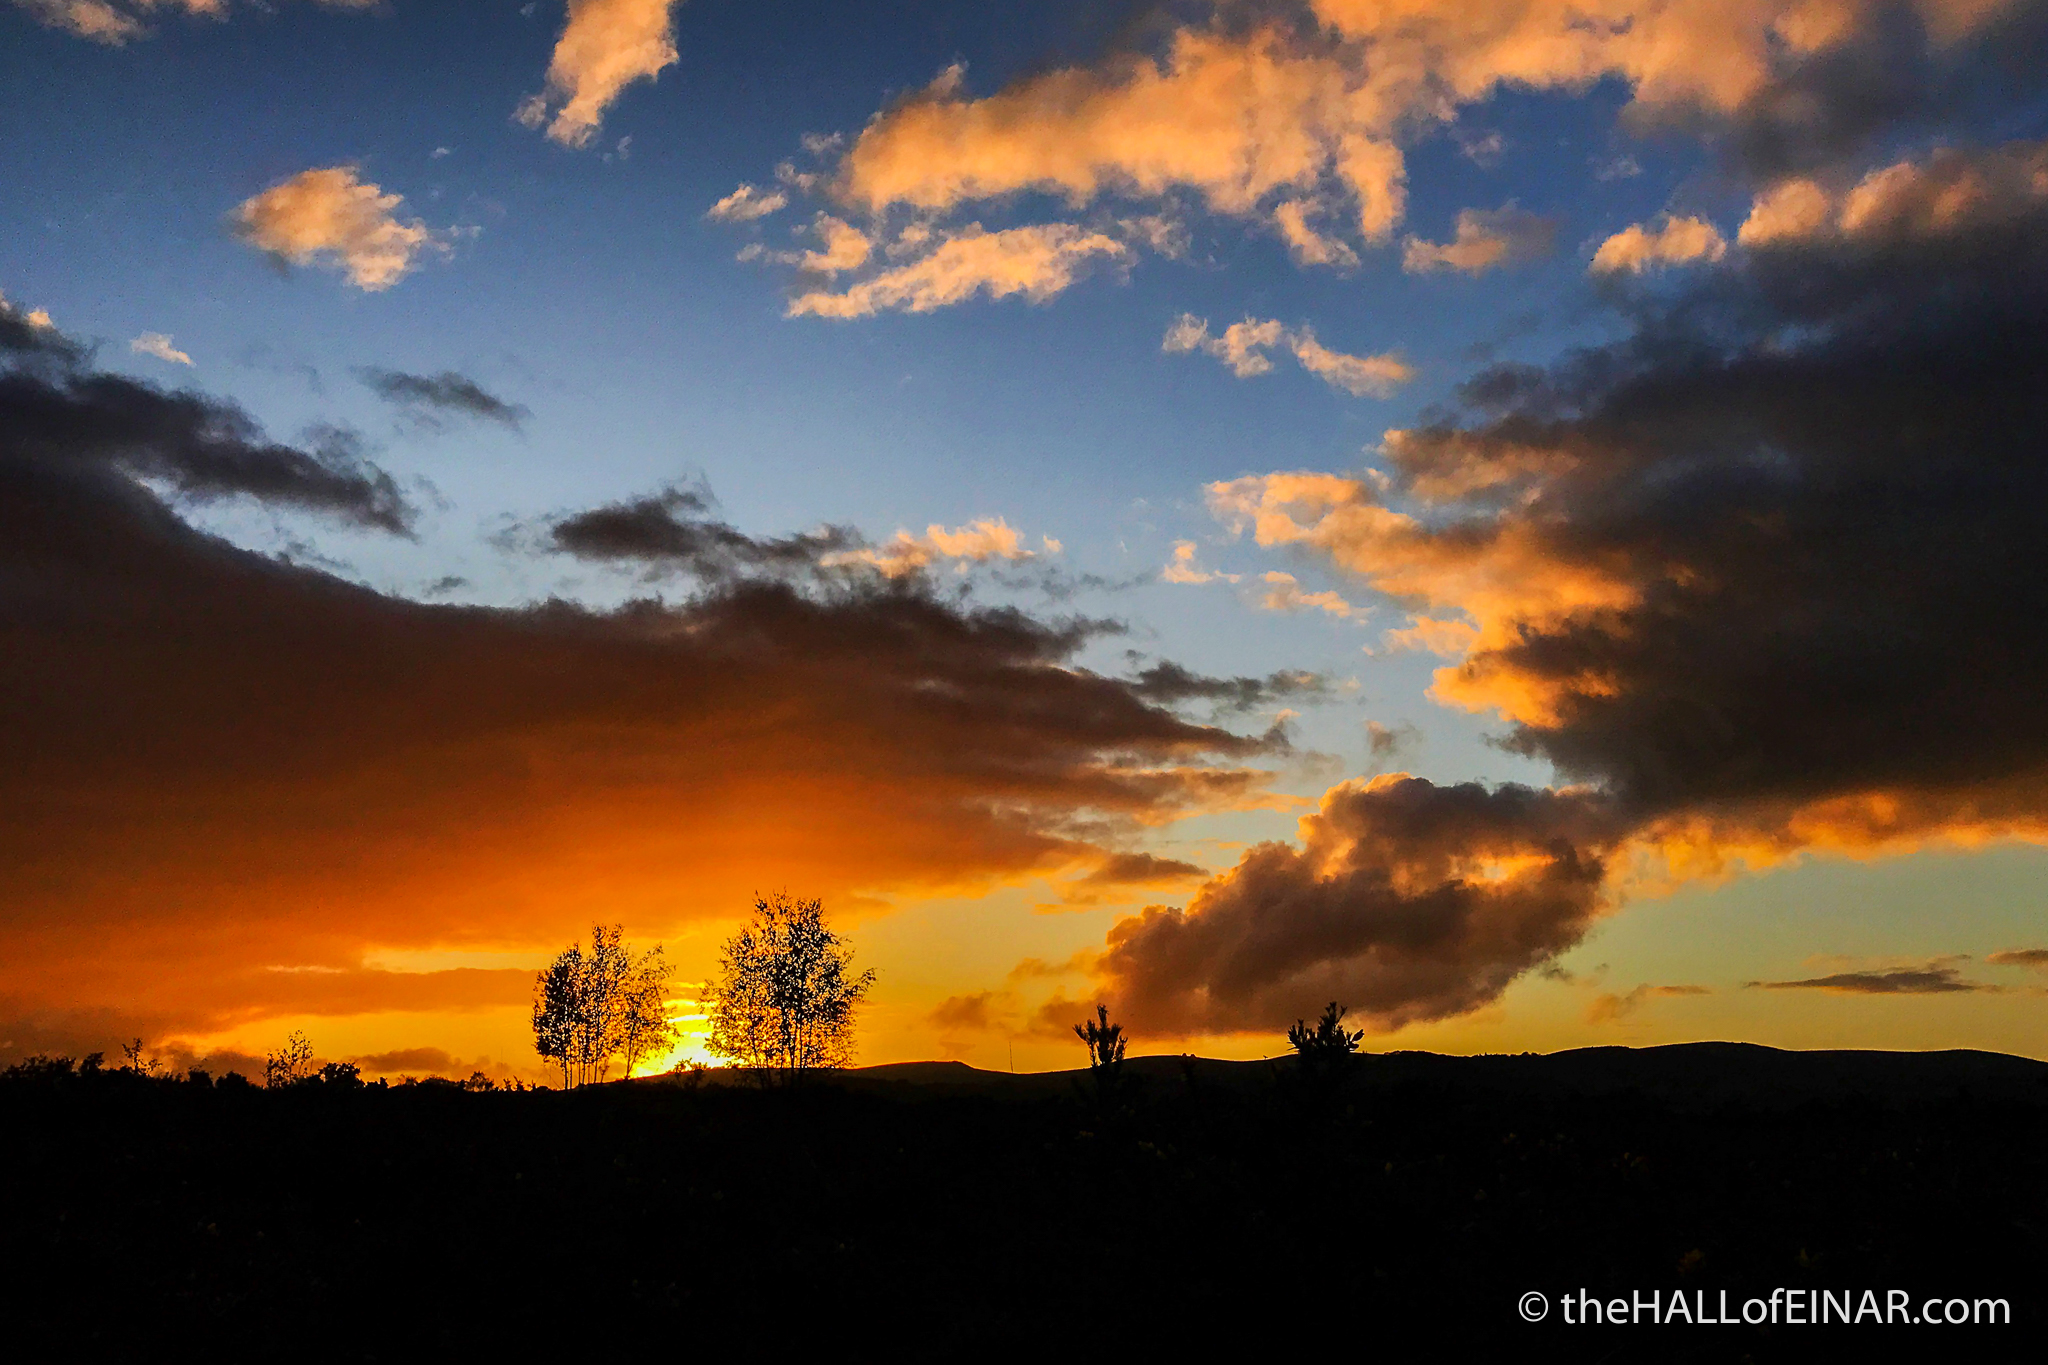 Sunset - Bovey Heath - The Hall of Einar - photograph (c) David Bailey (not the)